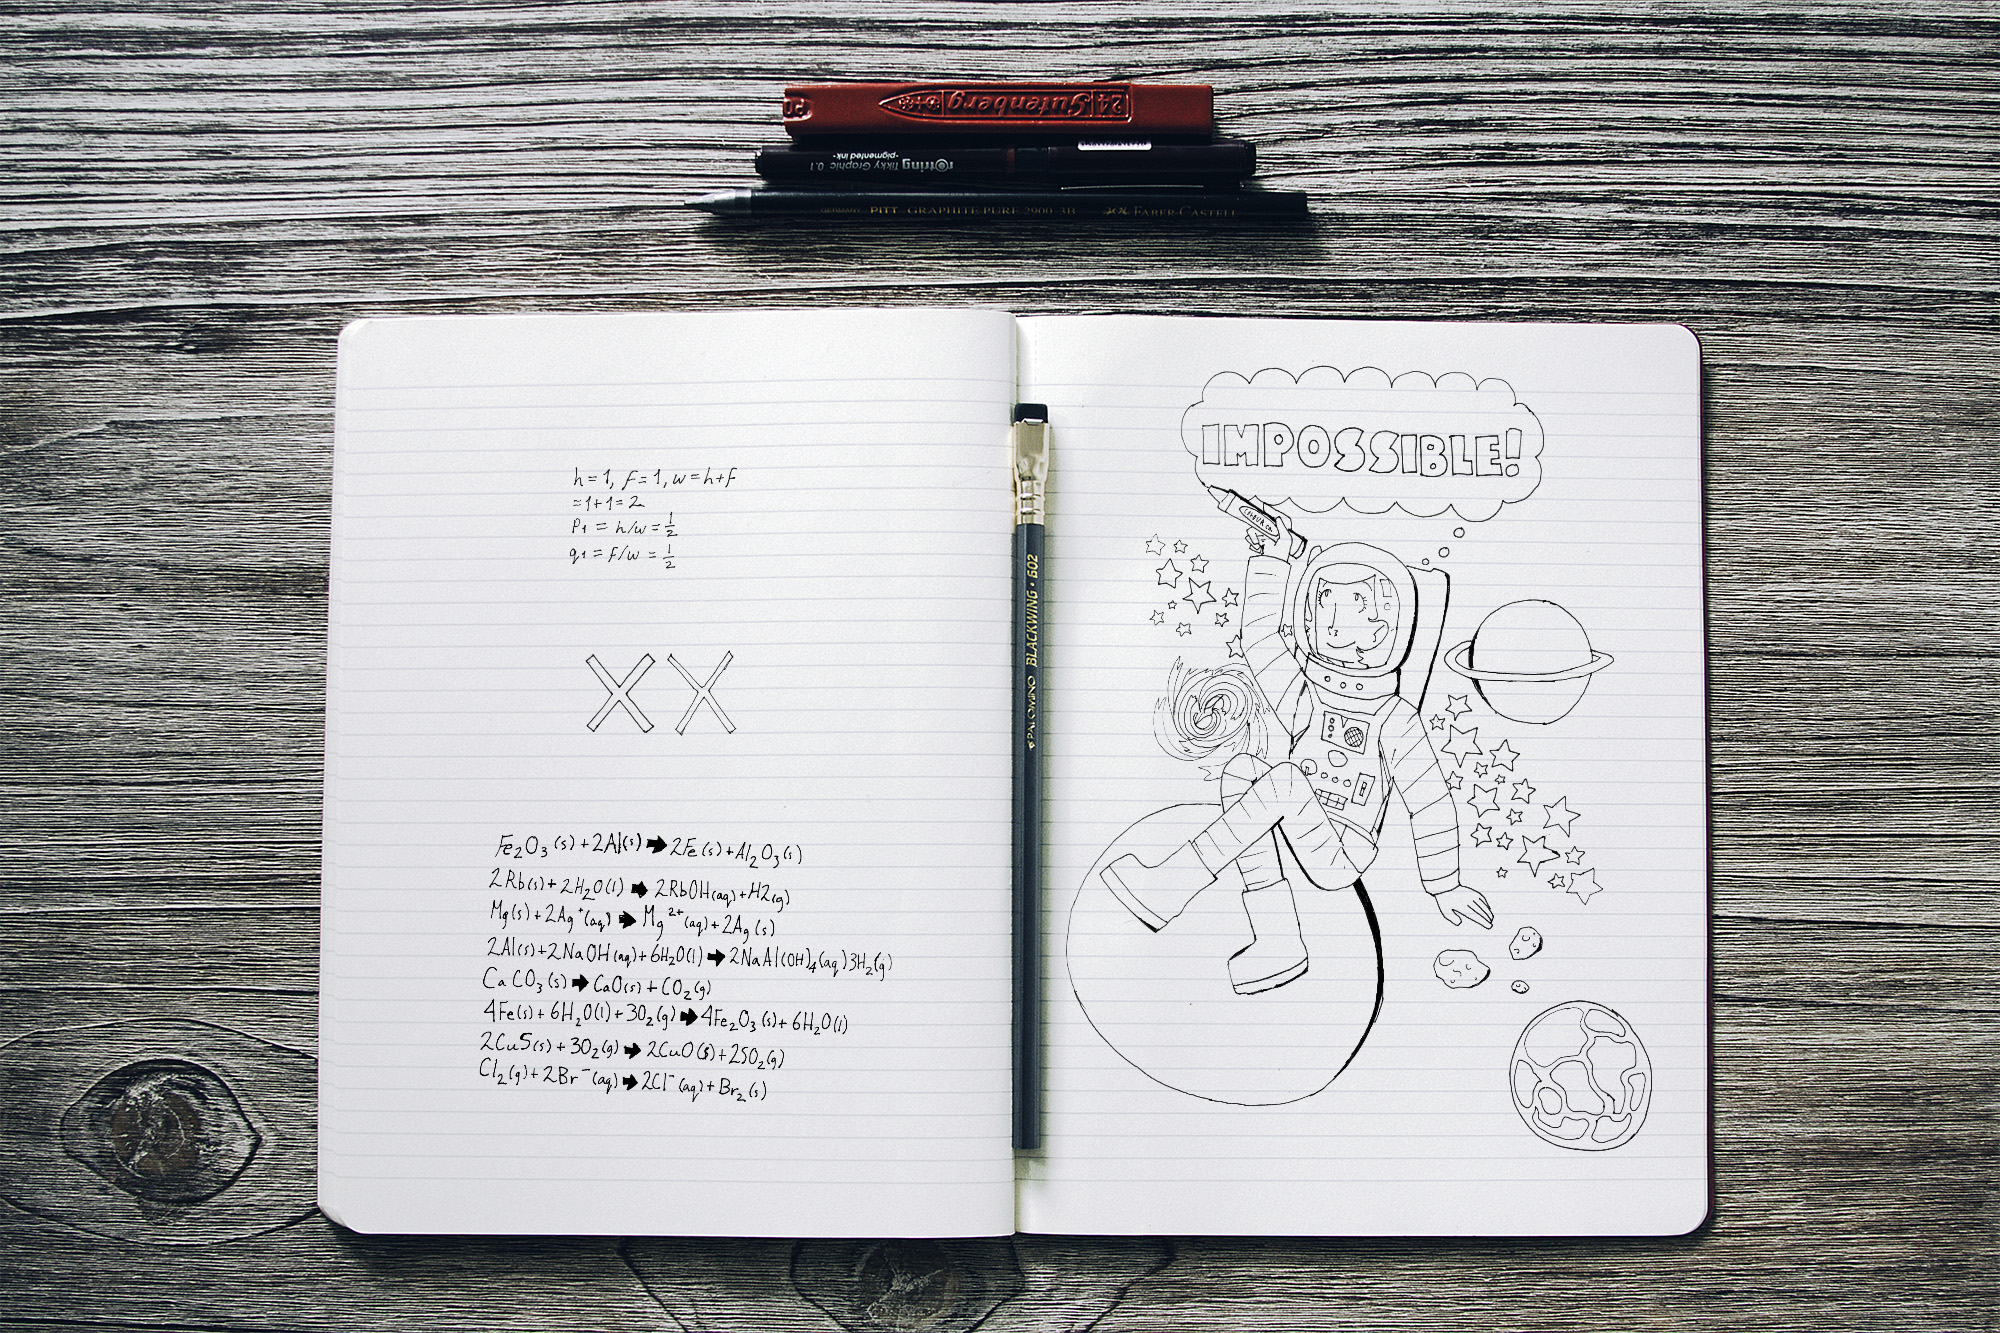 Girl Power sketchbook 2000px